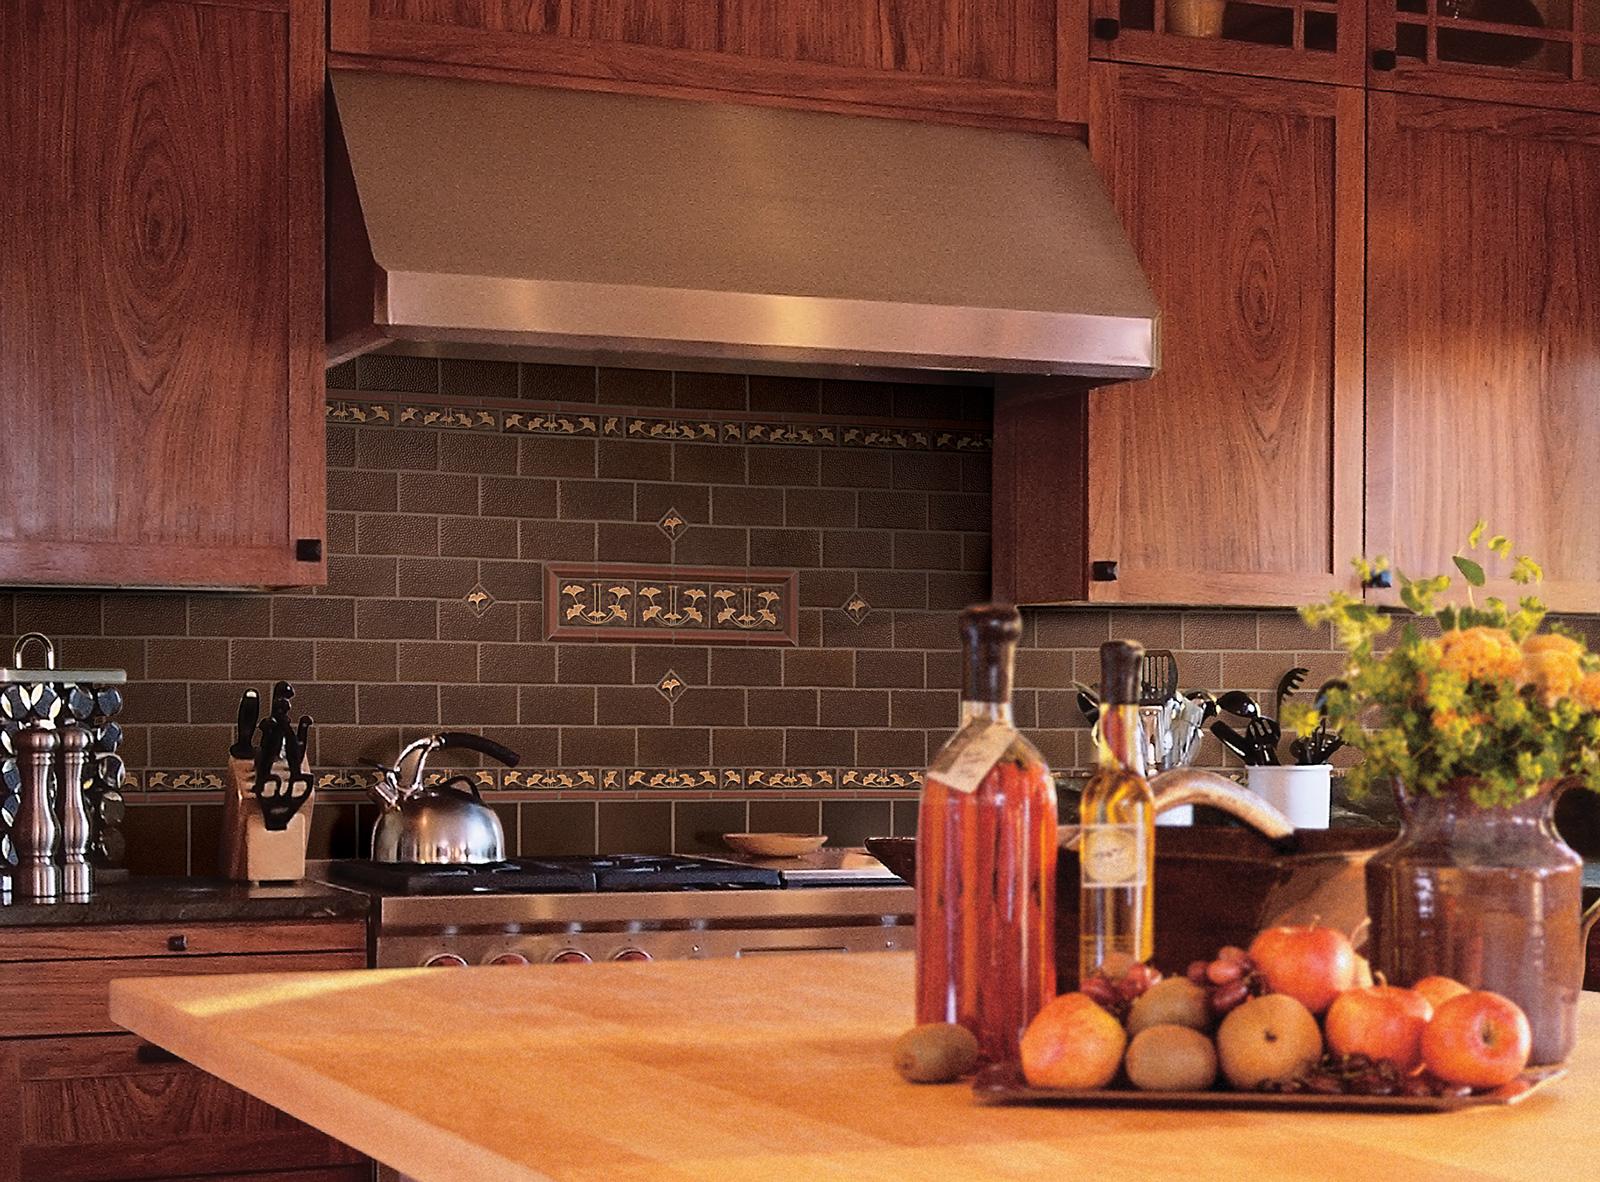 shearrow-tile-ginko-kitchen.jpg